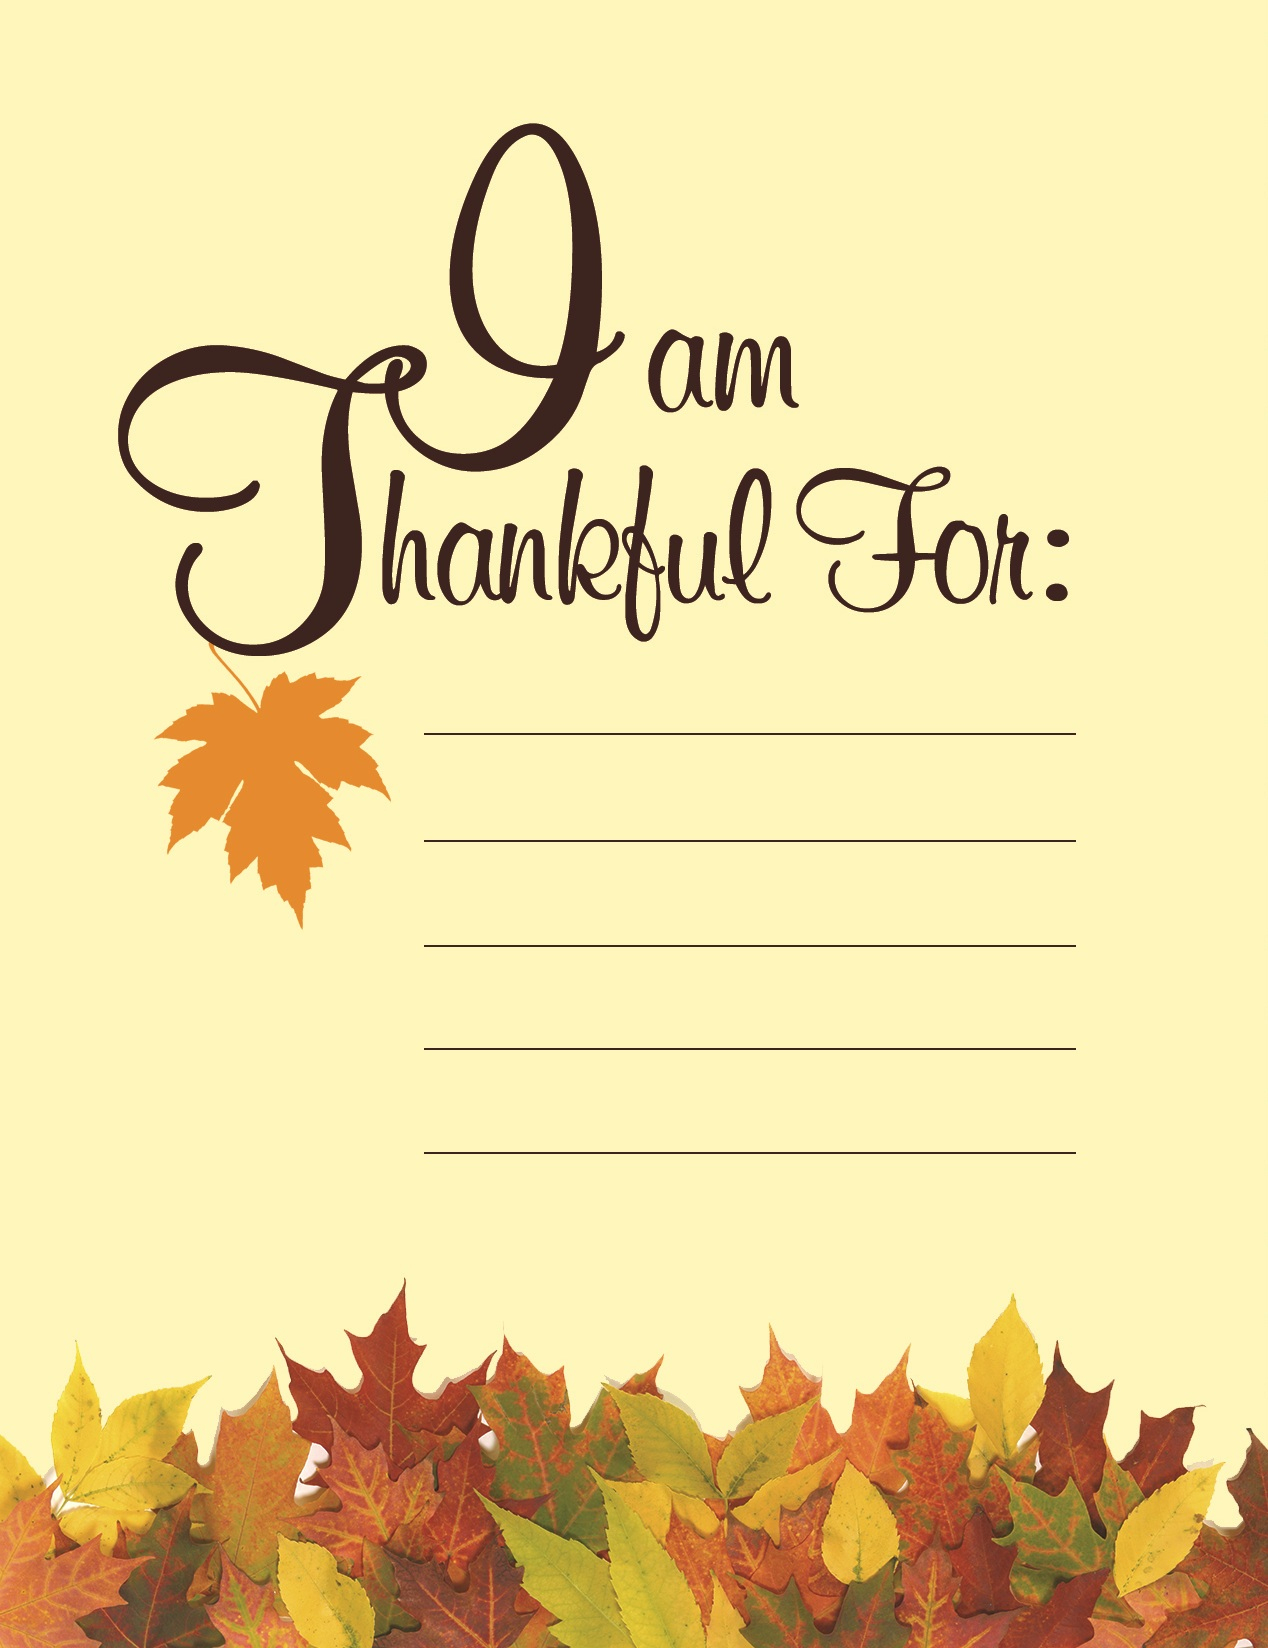 Gratitude This Thanksgiving | American Greetings Blog - Happy Thanksgiving Cards Free Printable